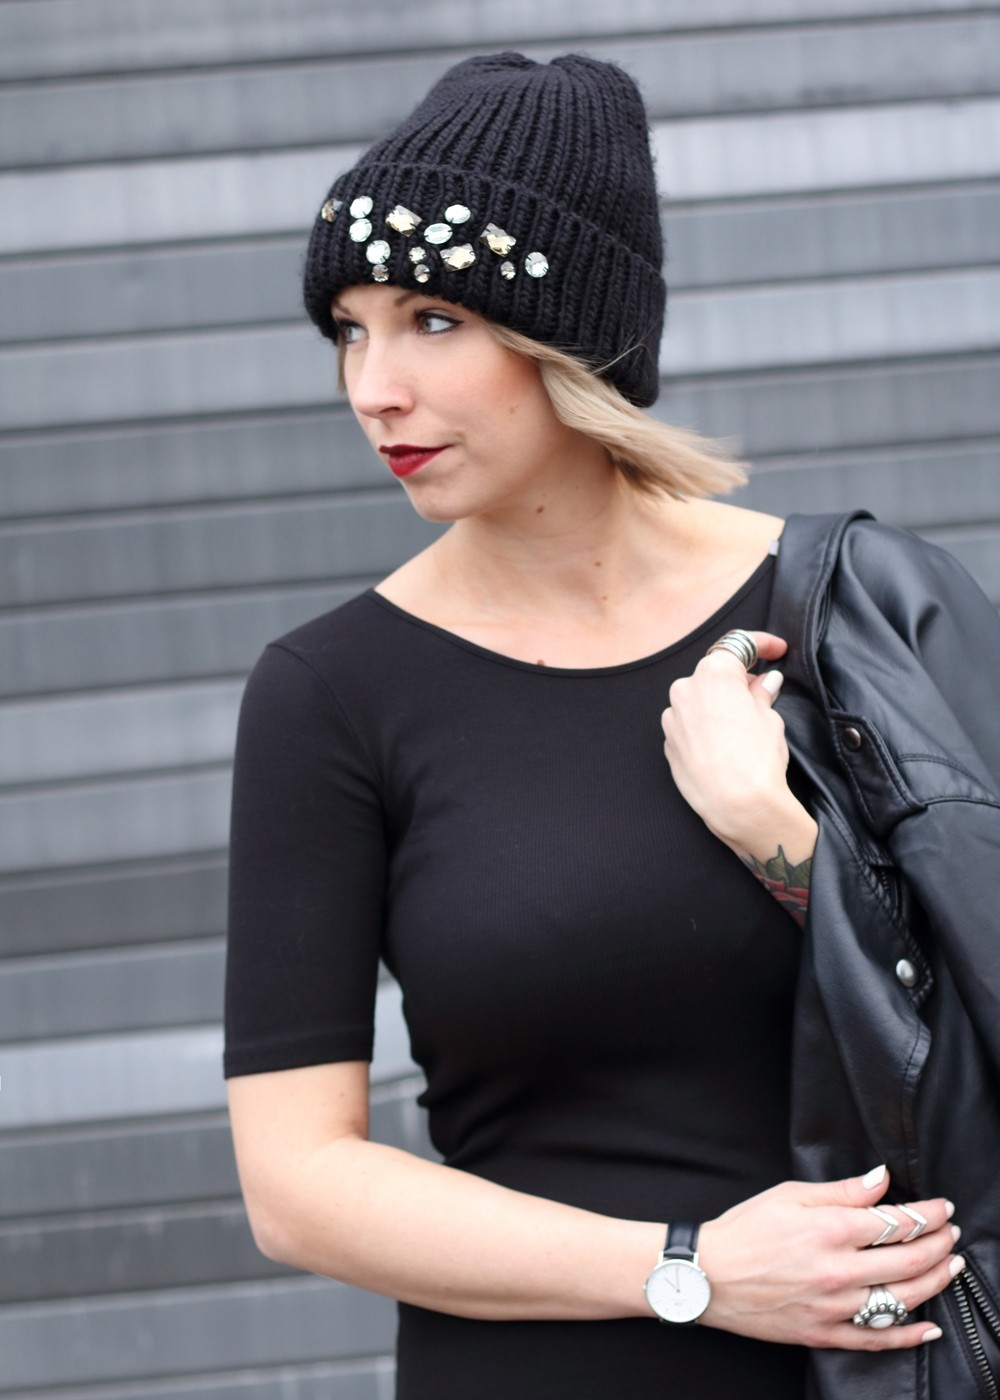 Outfit All in black Midikleid Lederjacke Chucks Beanie 14